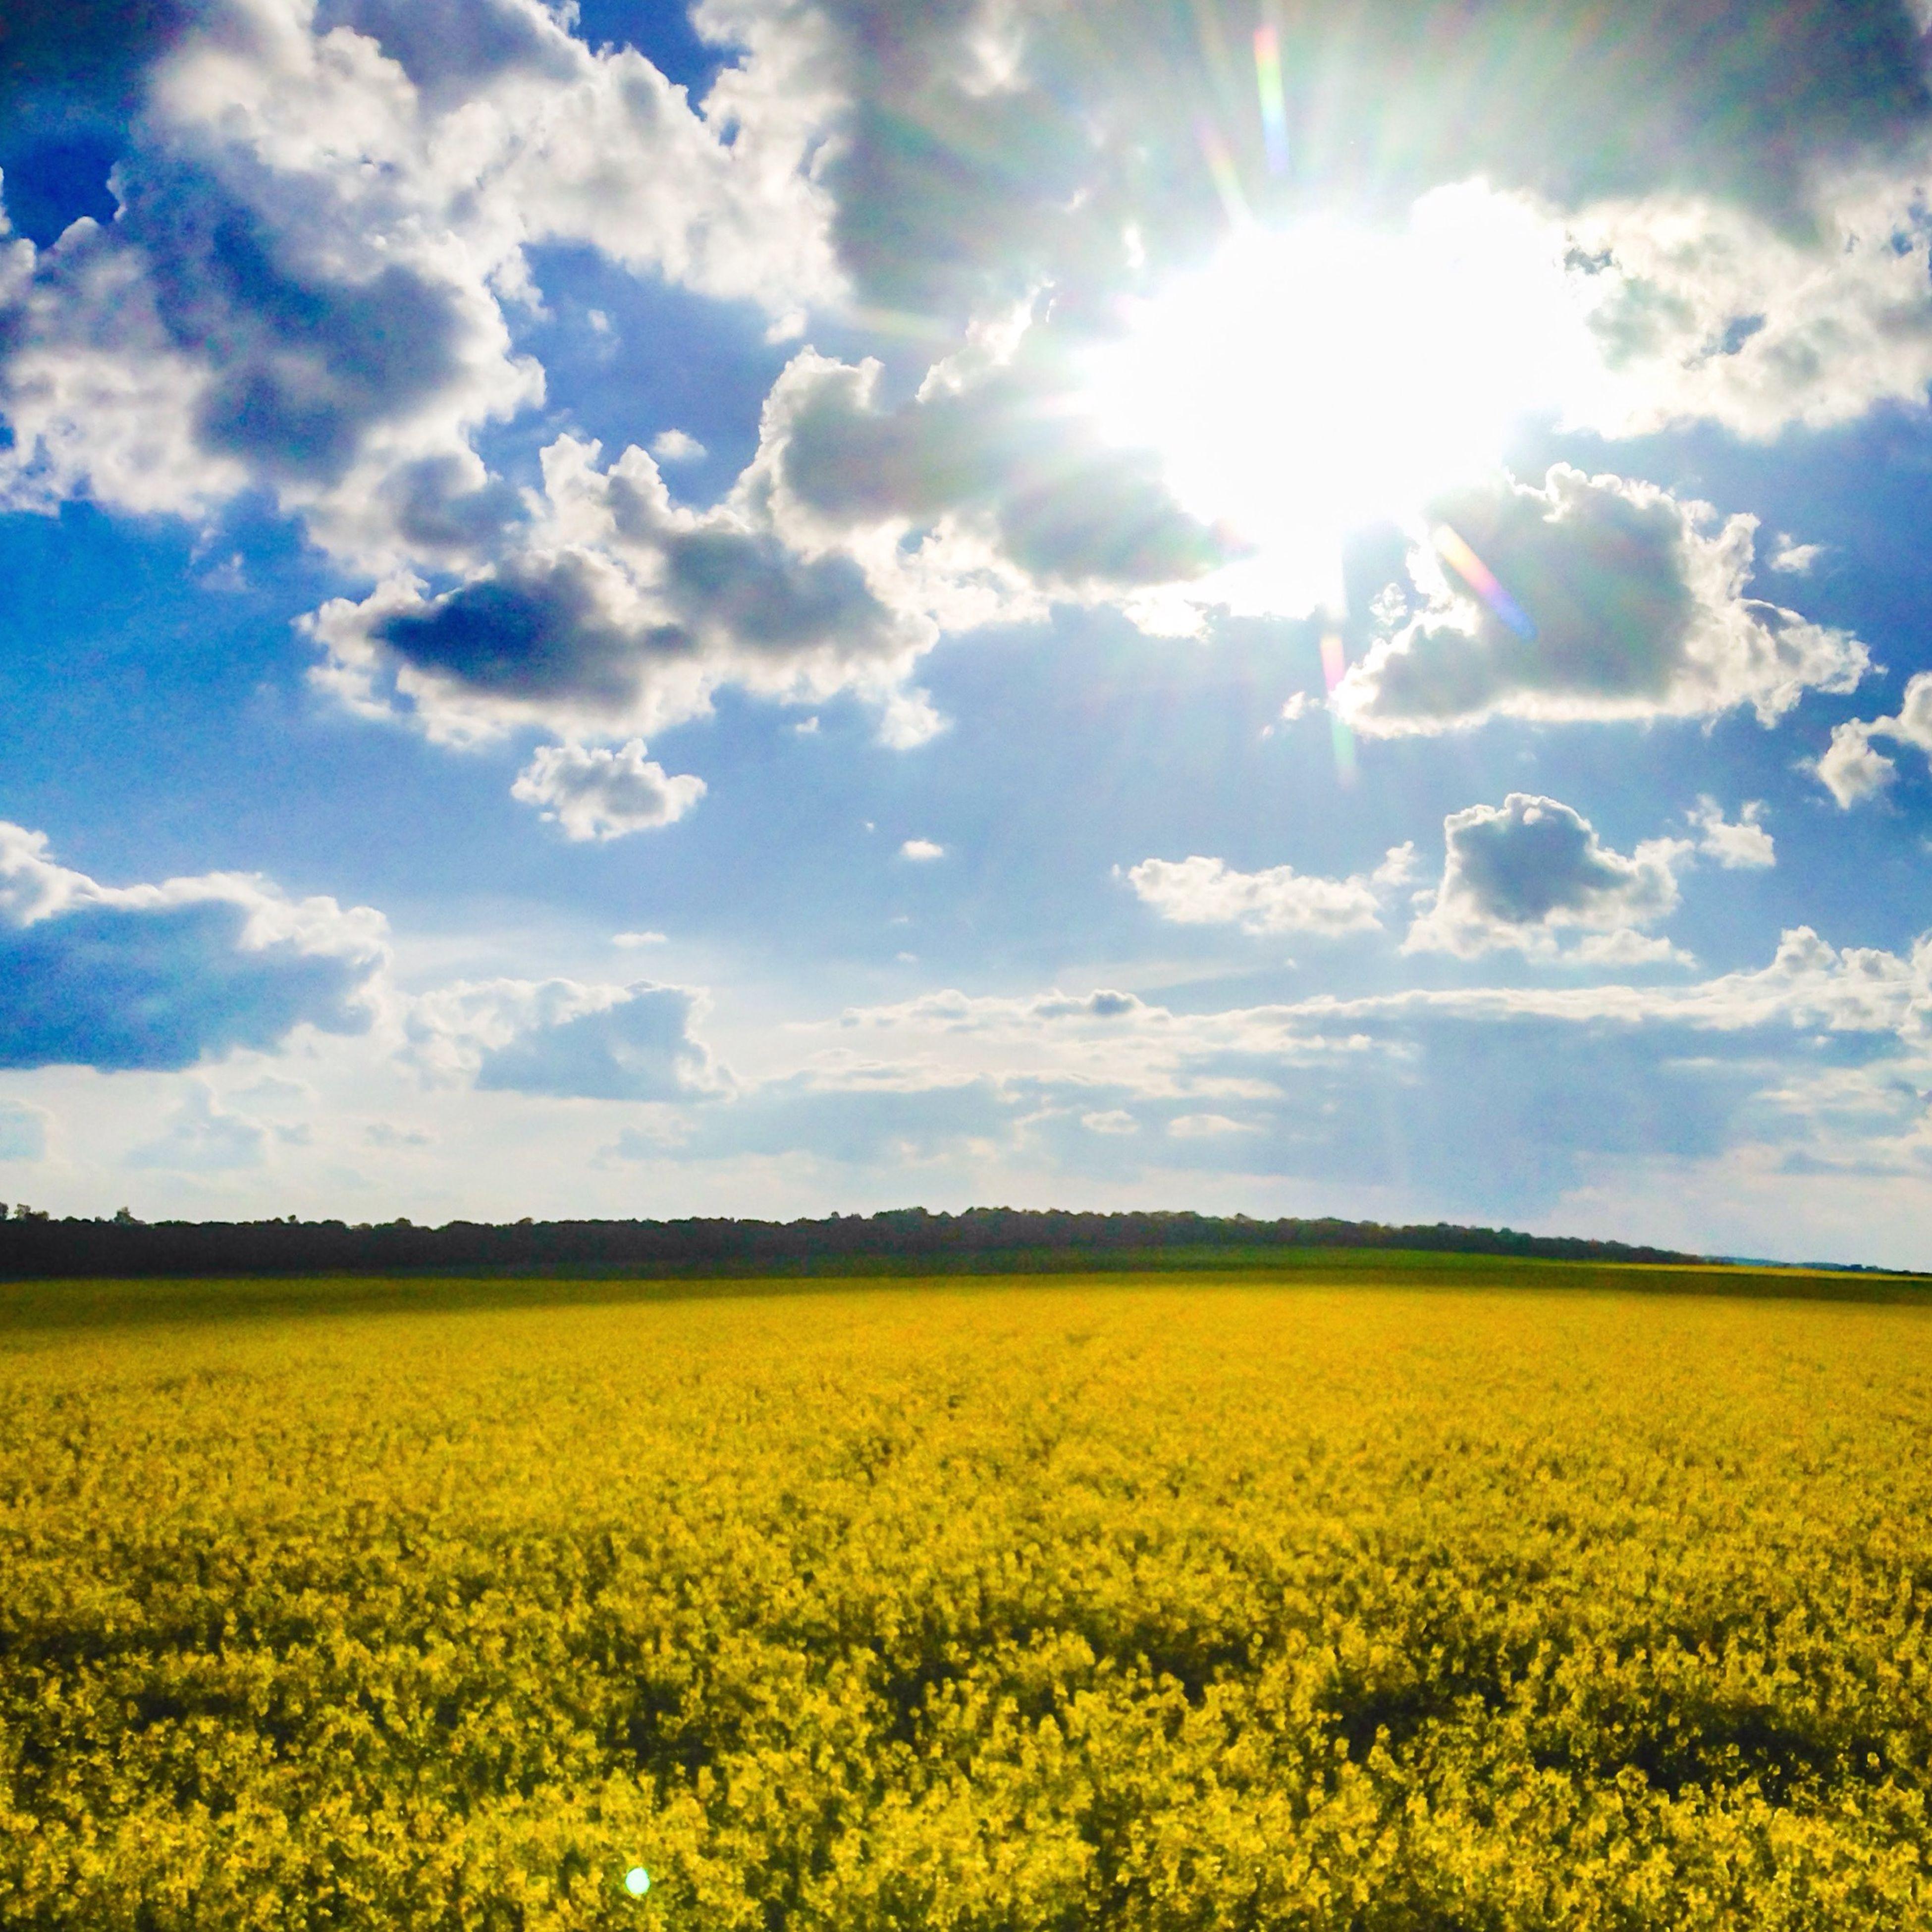 flower, yellow, field, rural scene, beauty in nature, agriculture, growth, landscape, sky, tranquil scene, freshness, nature, farm, scenics, tranquility, oilseed rape, crop, abundance, sunlight, cloud - sky